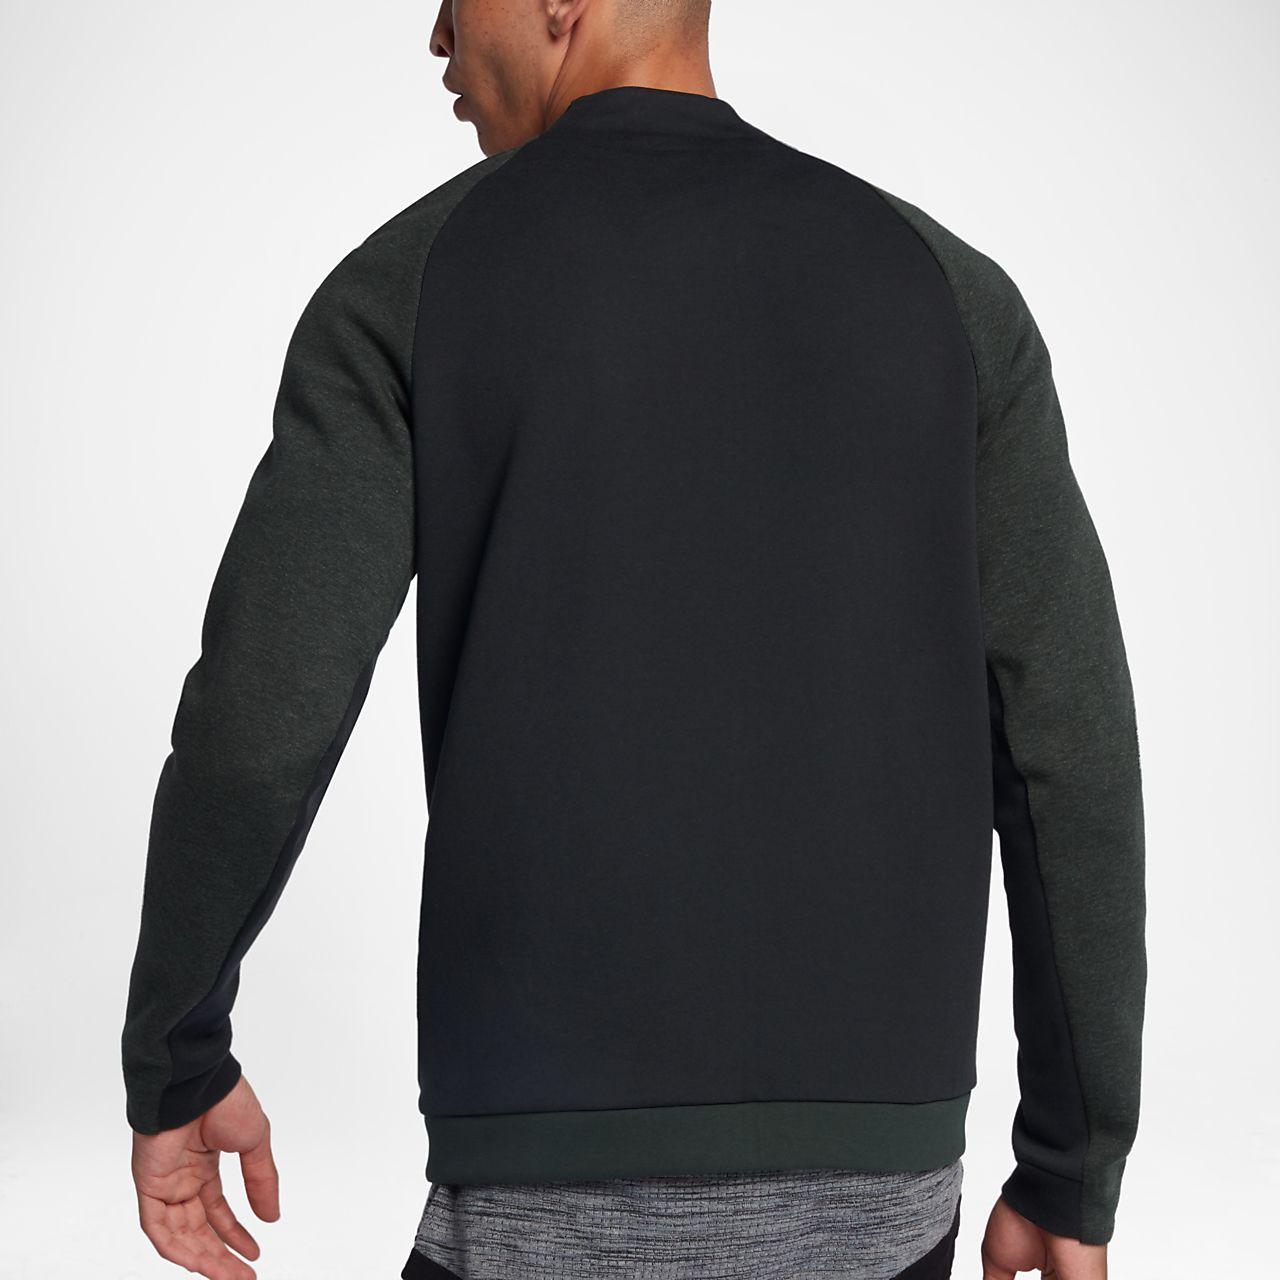 Nike tech fleece varsity men's jacket